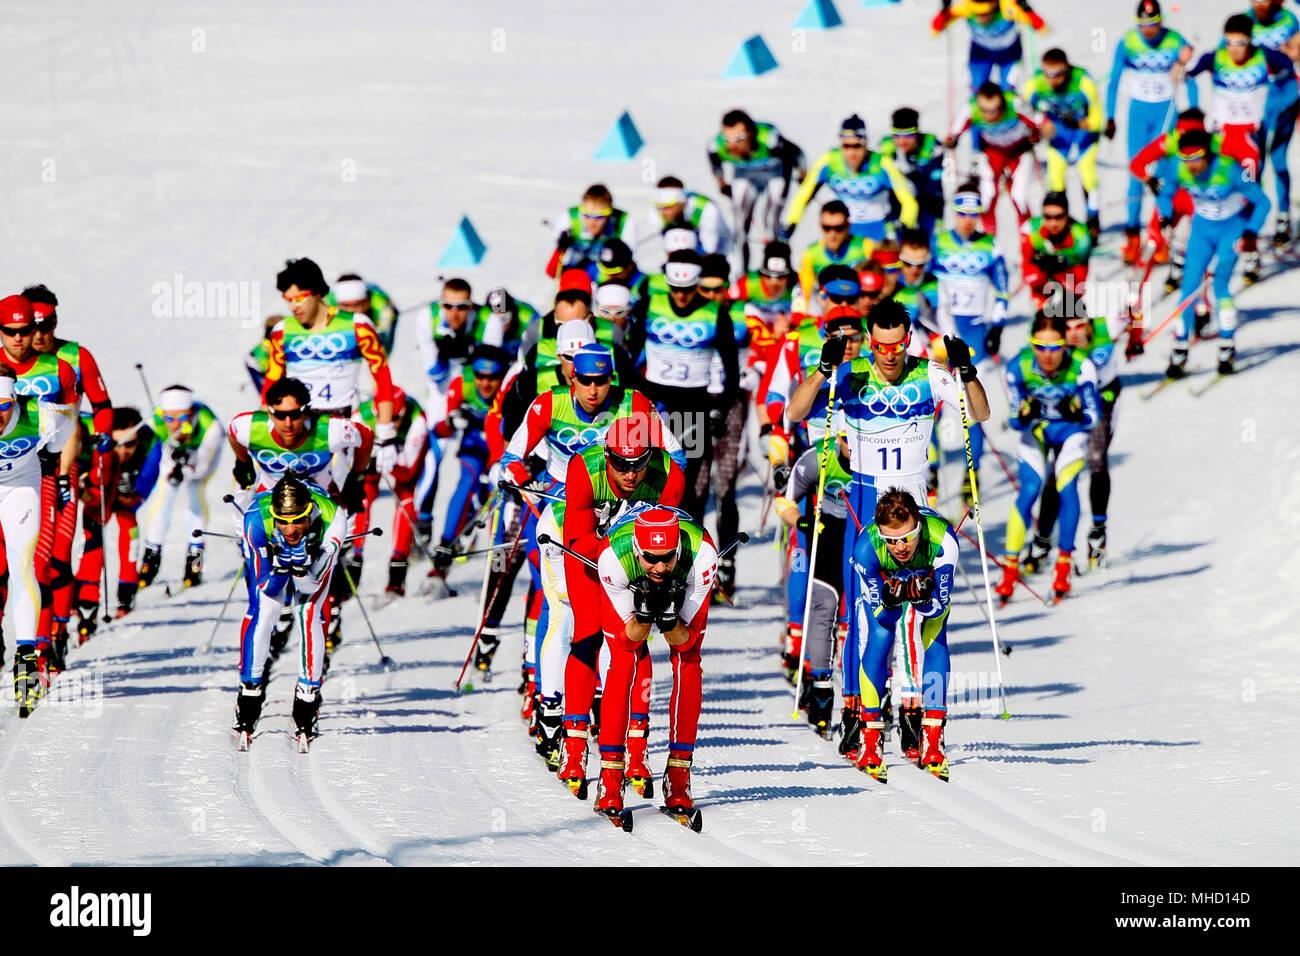 Men's 30K Pursuit, Cross Country Ski Race.  Vancouver Olympics, February 20, 2010. Stock Photo